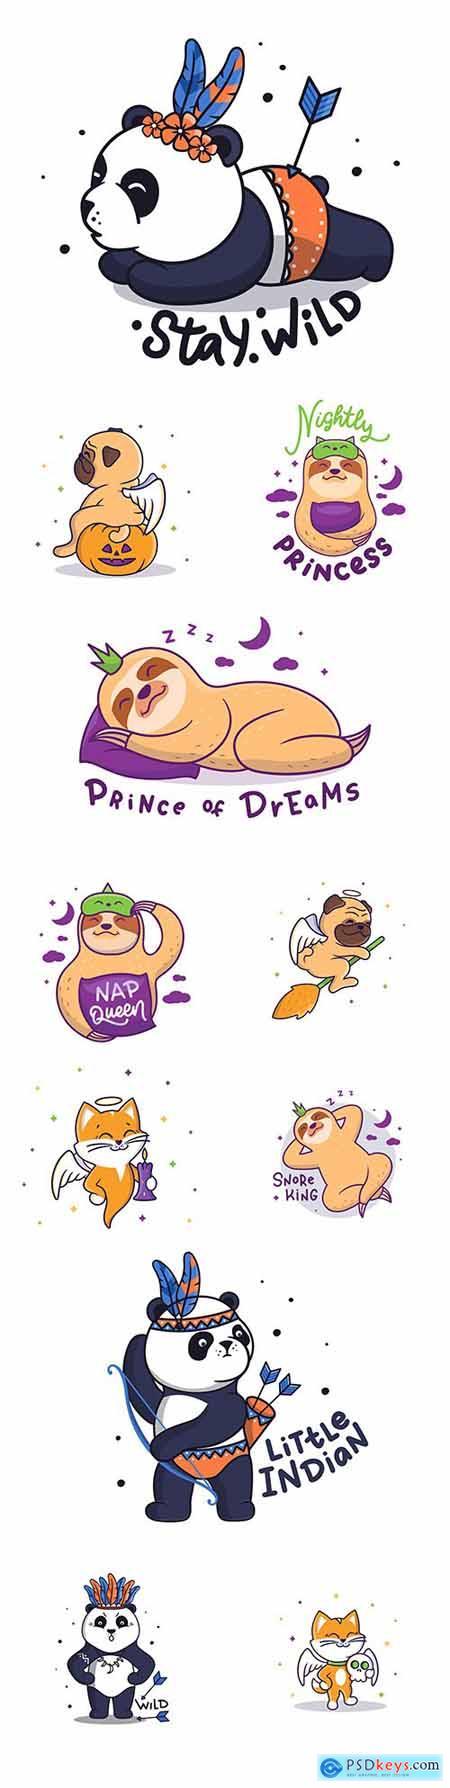 Panda and lazy funny cartoon characters hand-drawn illustrations